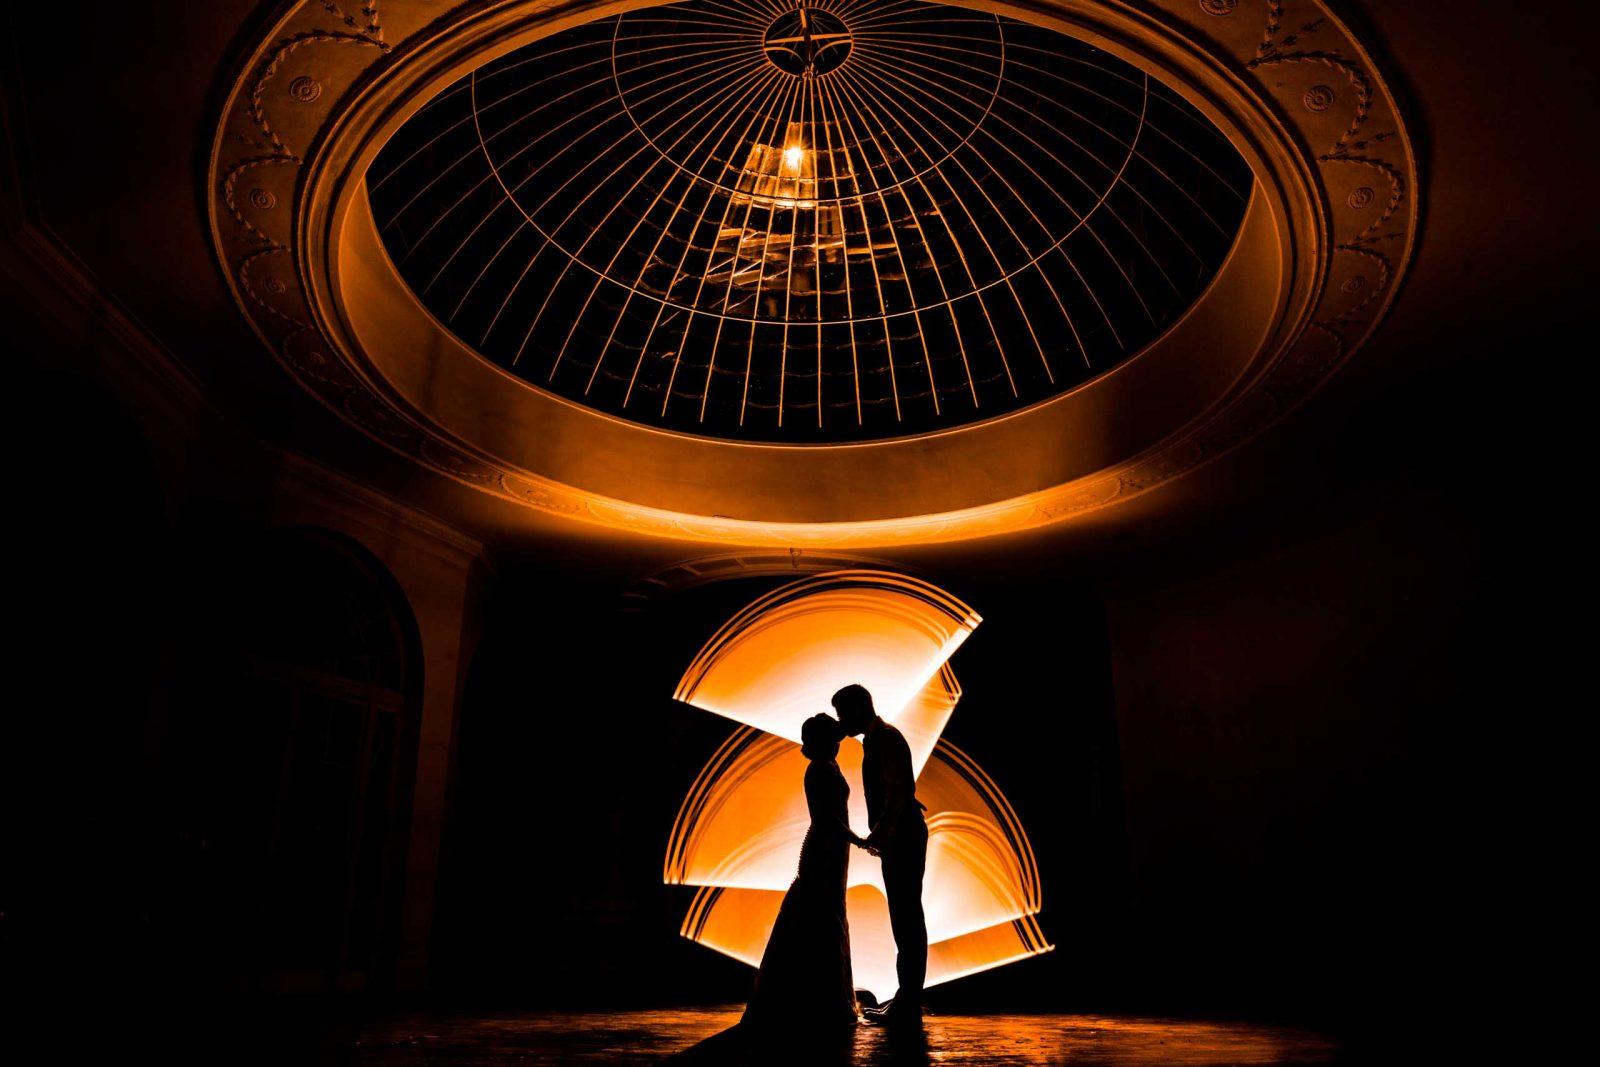 Barton hall orangery at night illuminated with creative lighting and light painting